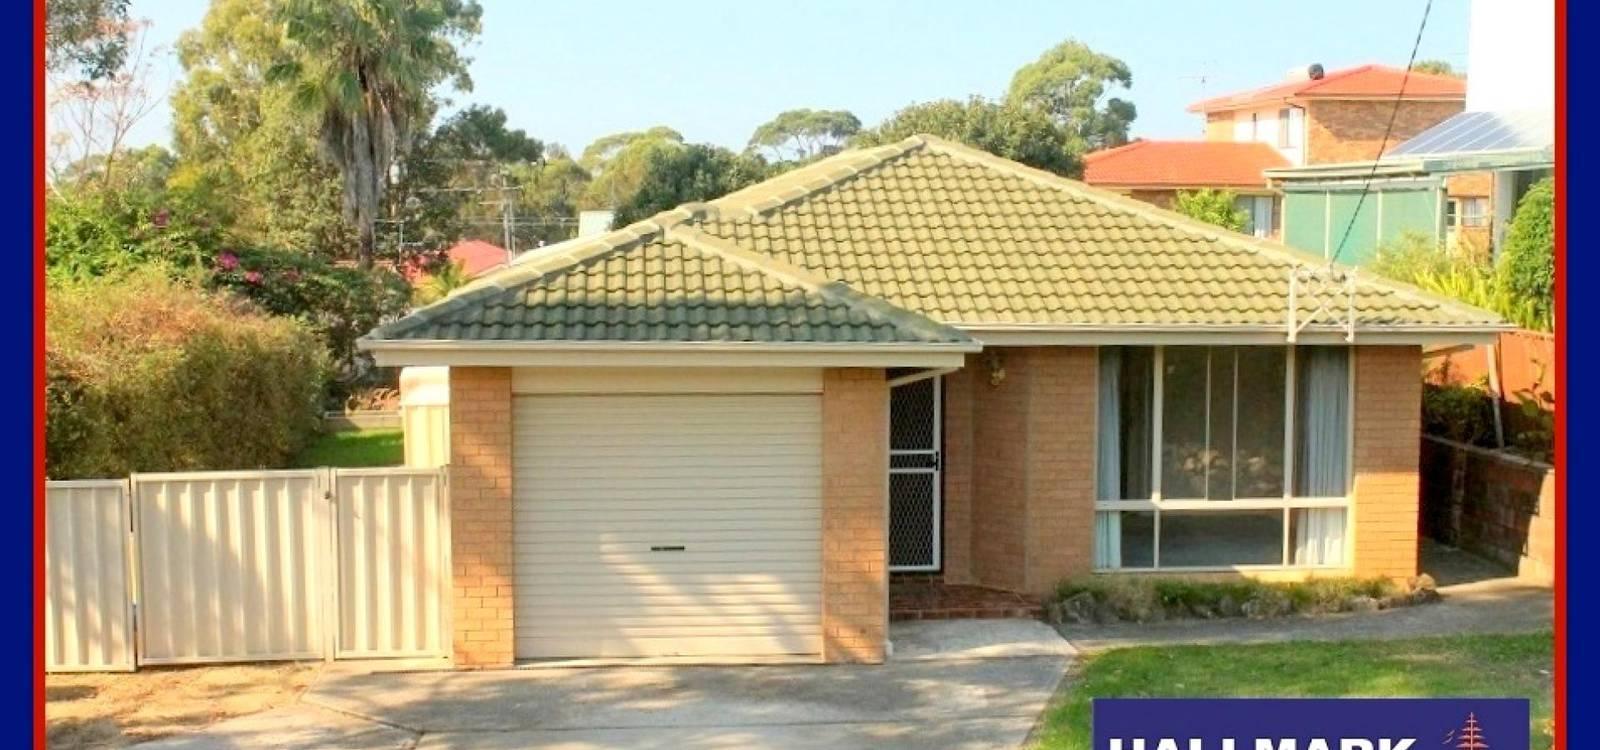 26 Coogee Street TUROSS HEAD, NSW 2537 - photo 1